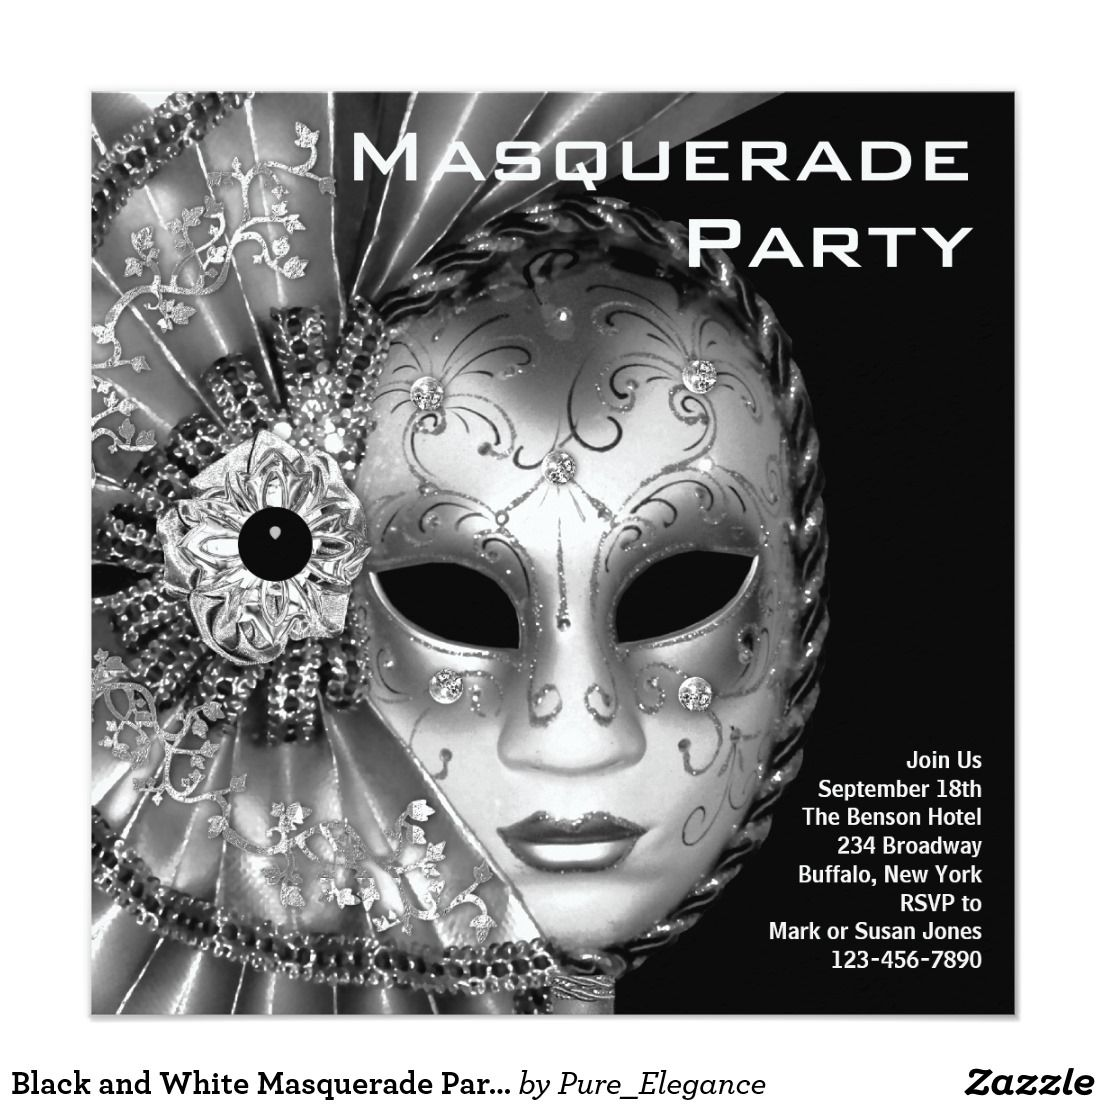 Black and White Masquerade Party Invitation | Masquerade party ...